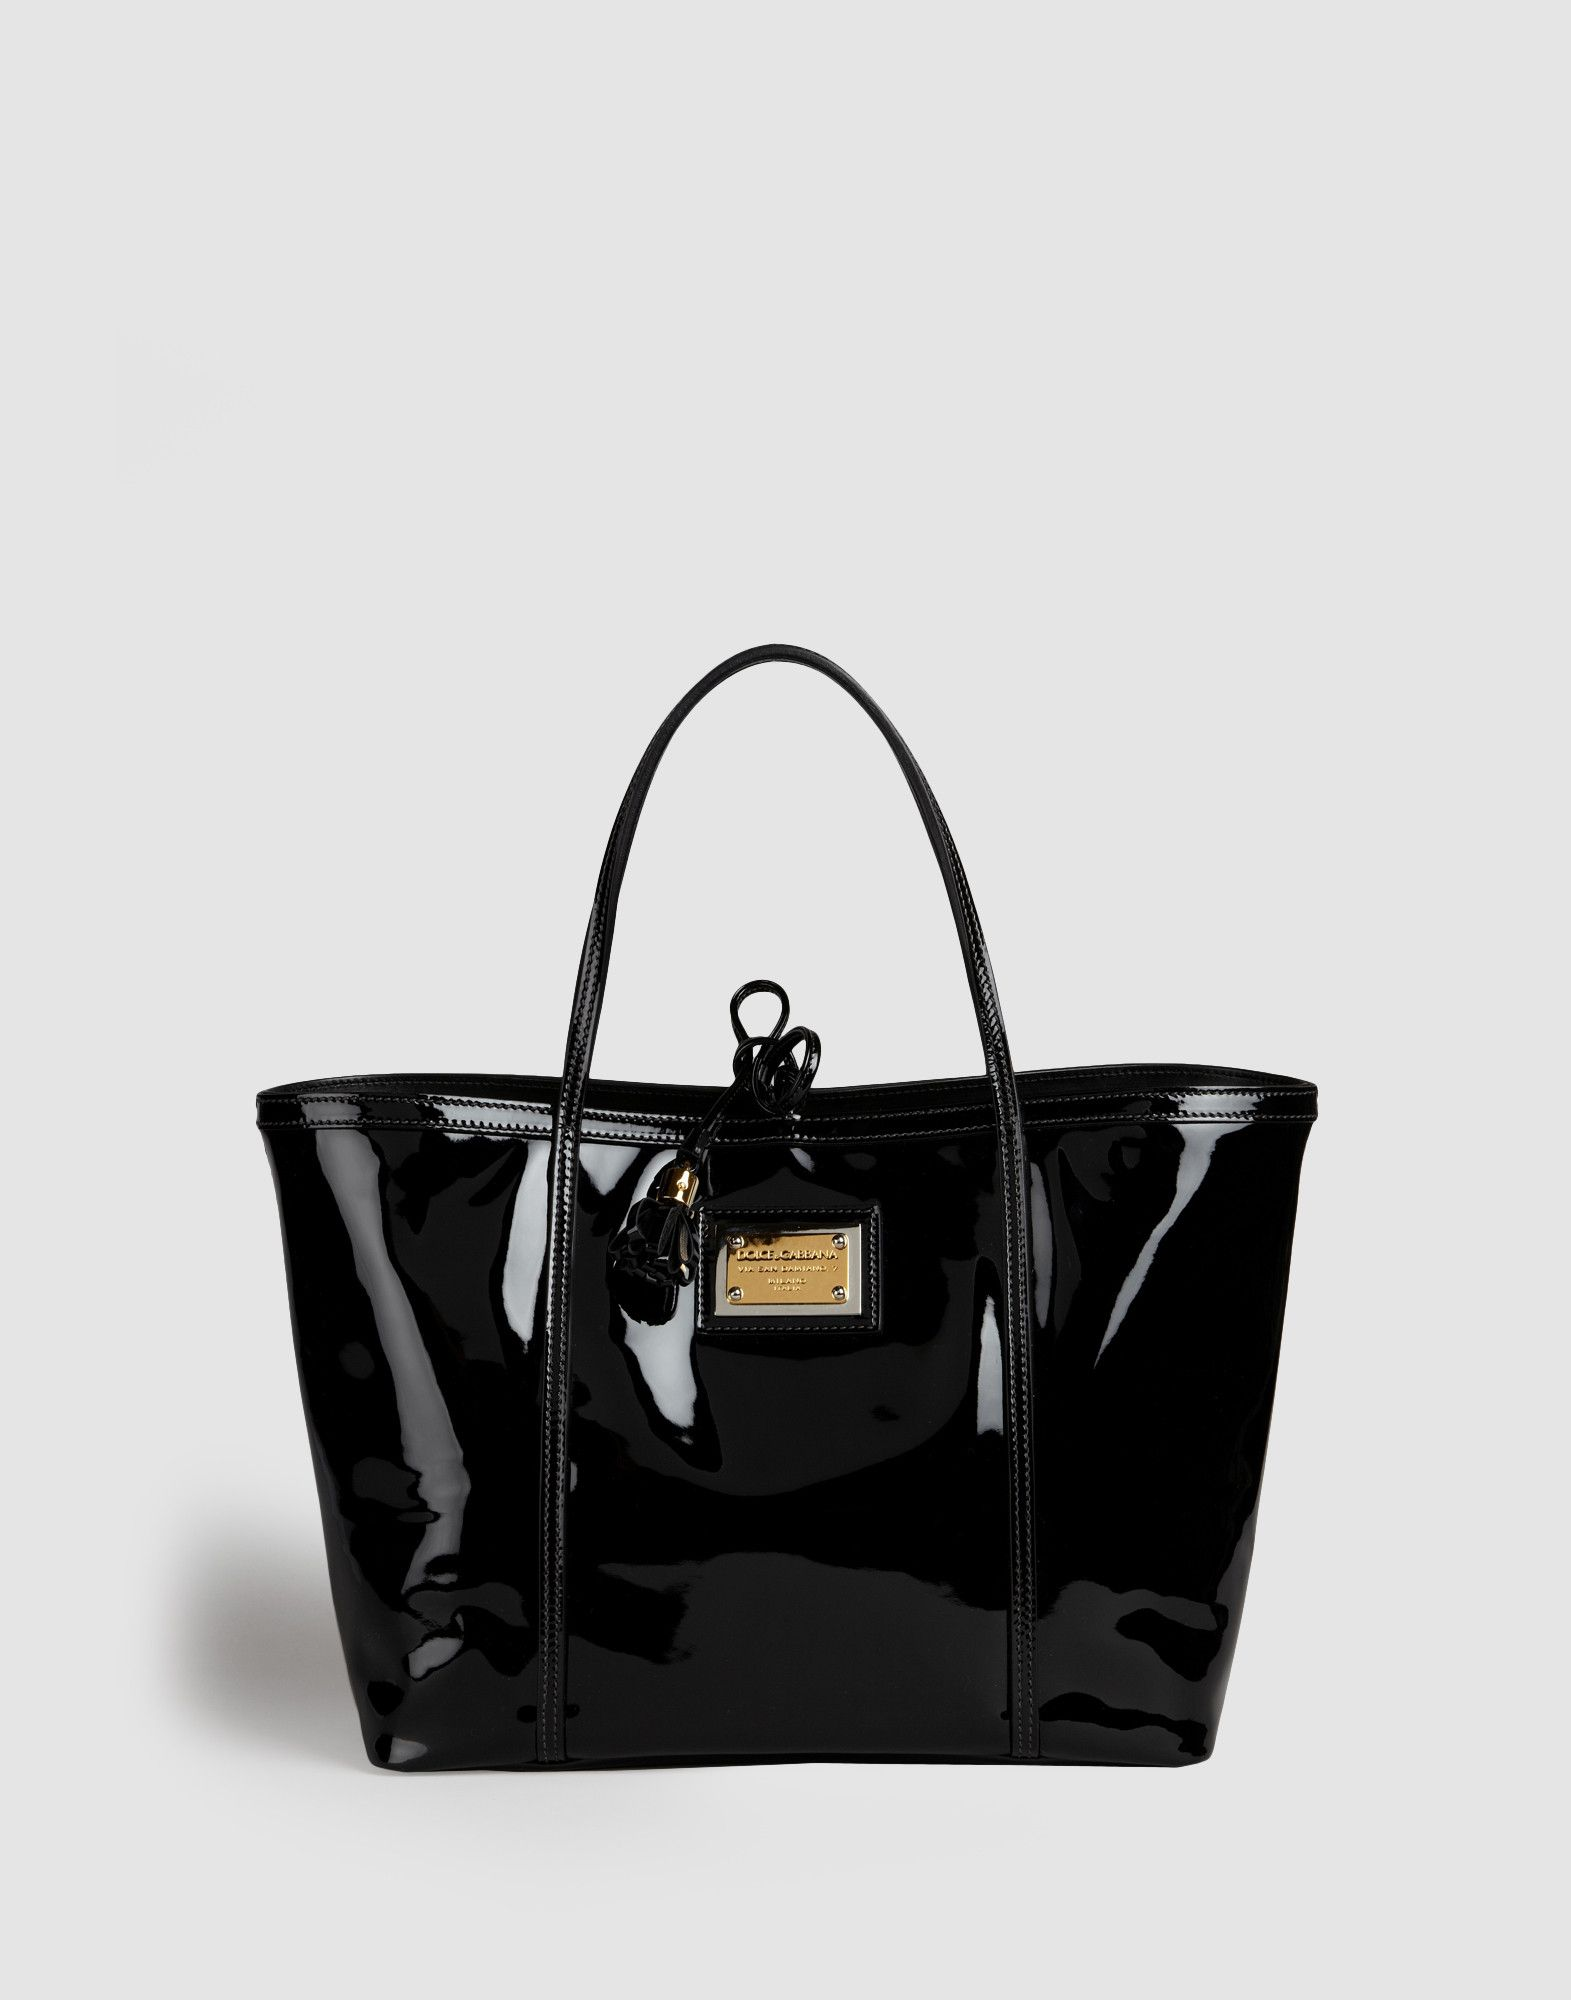 Dolce-Gabbana-womens-large-leather-tote-bag-1.jpg (1571×2000)